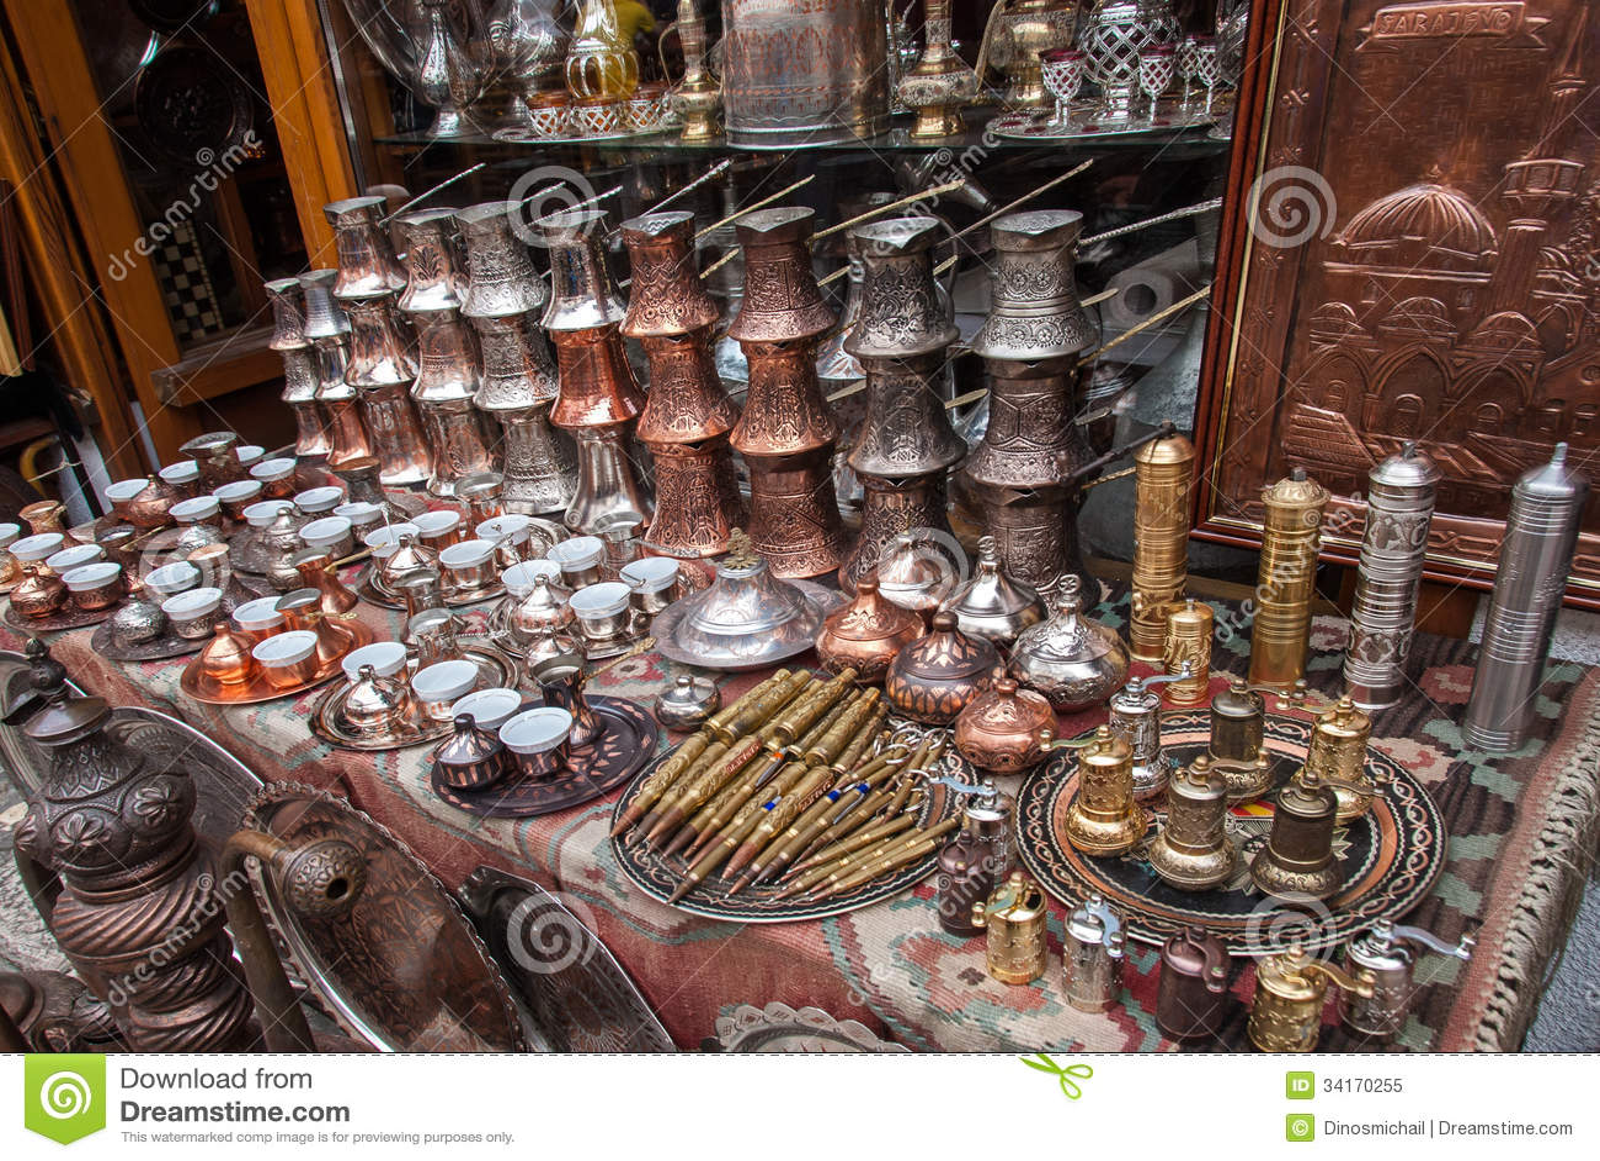 Souvenirs From Sarajevo Bosnia And Herzegovina Royalty